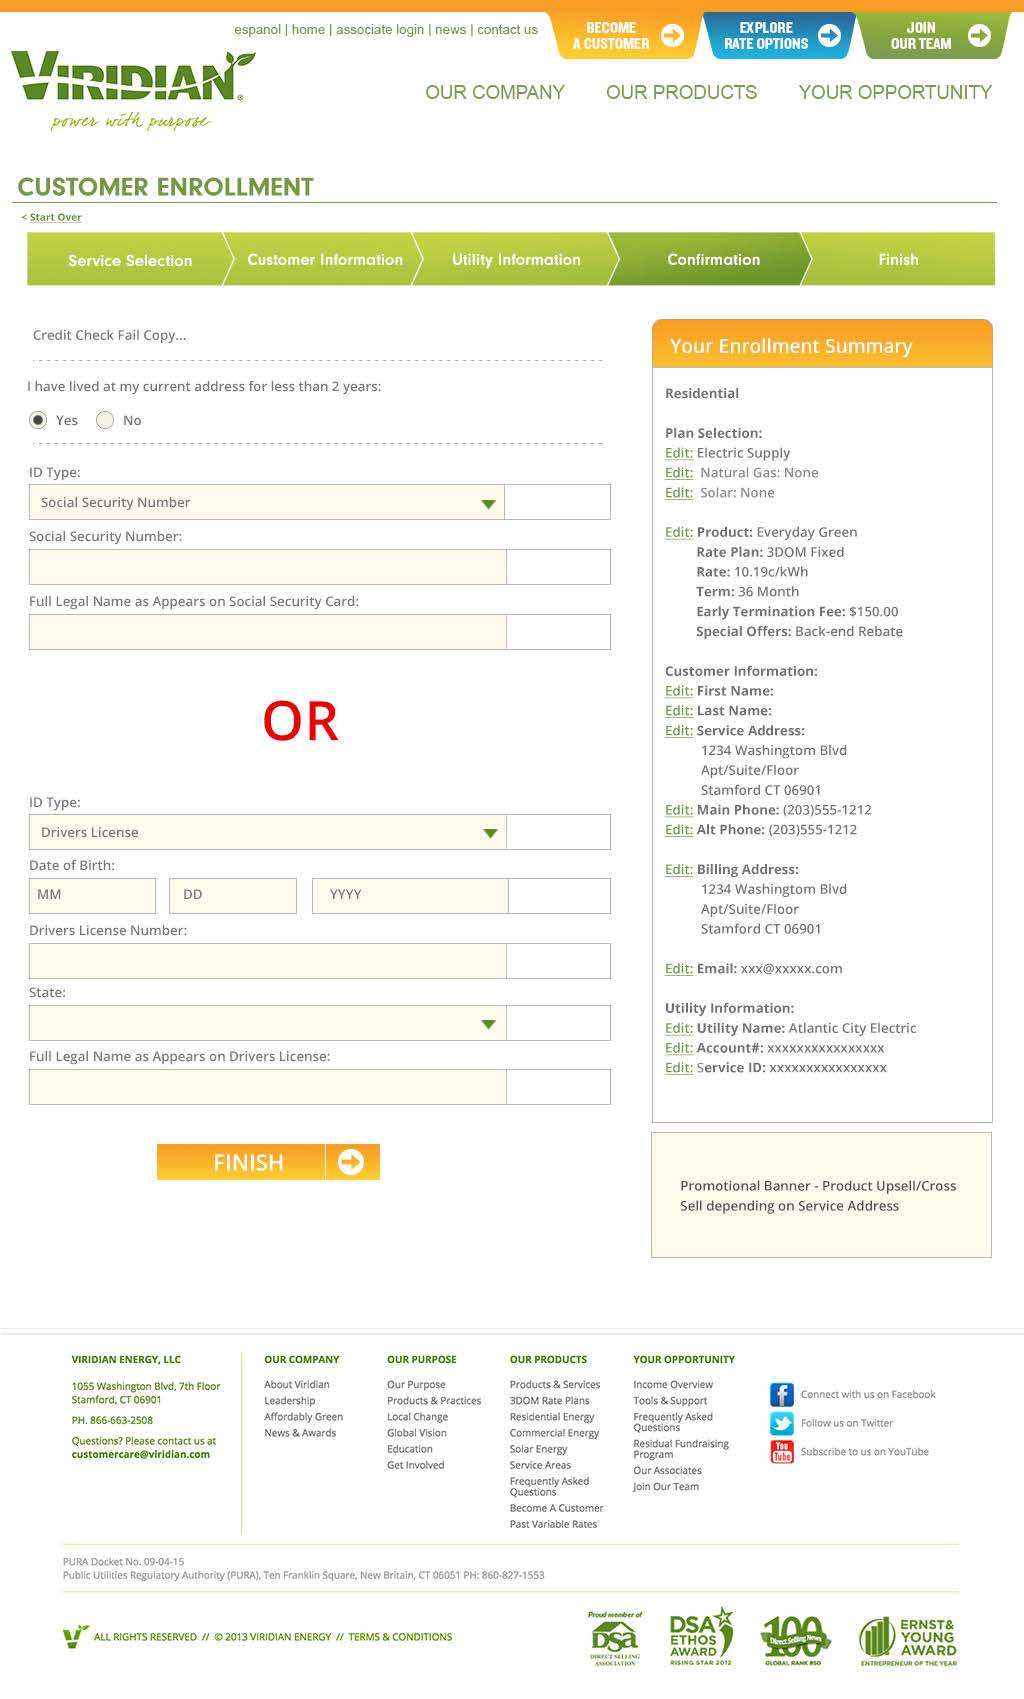 Customer Enrollment Screens 04282015_Page_10